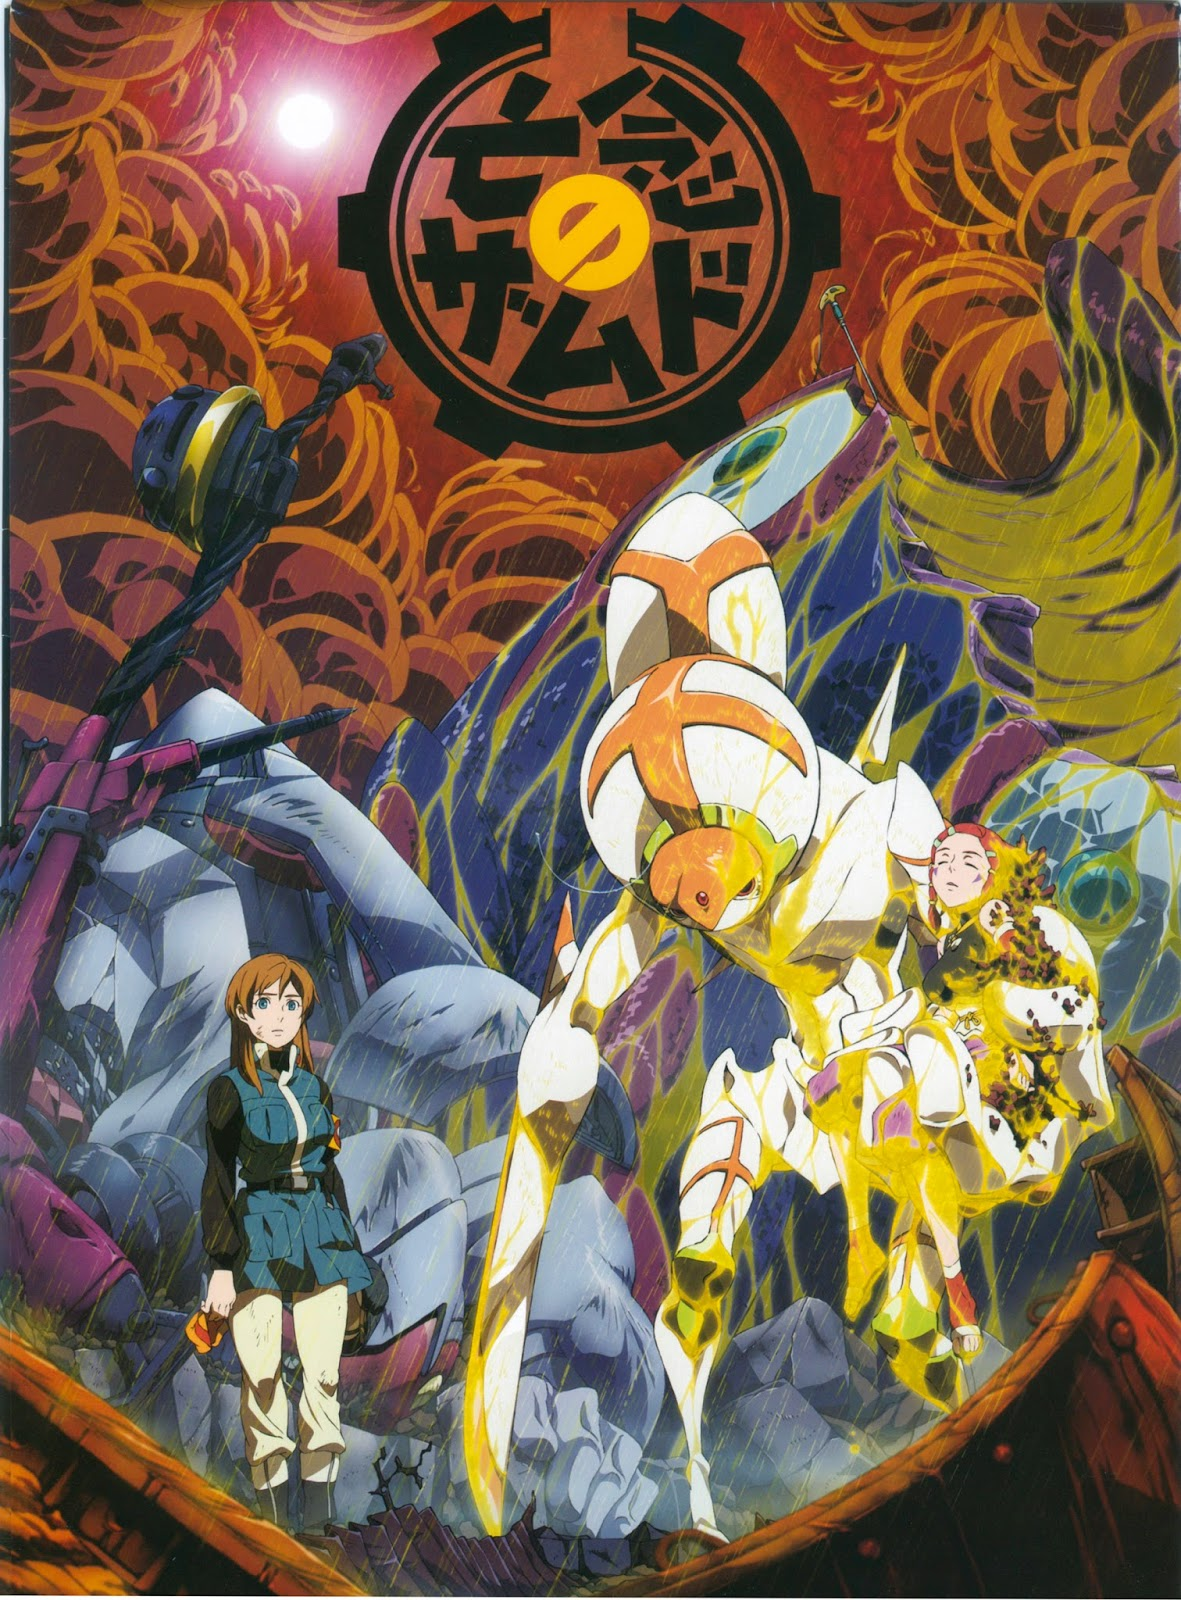 Mecha Girls Wallpaper Moonlight Summoner S Anime Sekai Xam D Lost Memories 亡念の